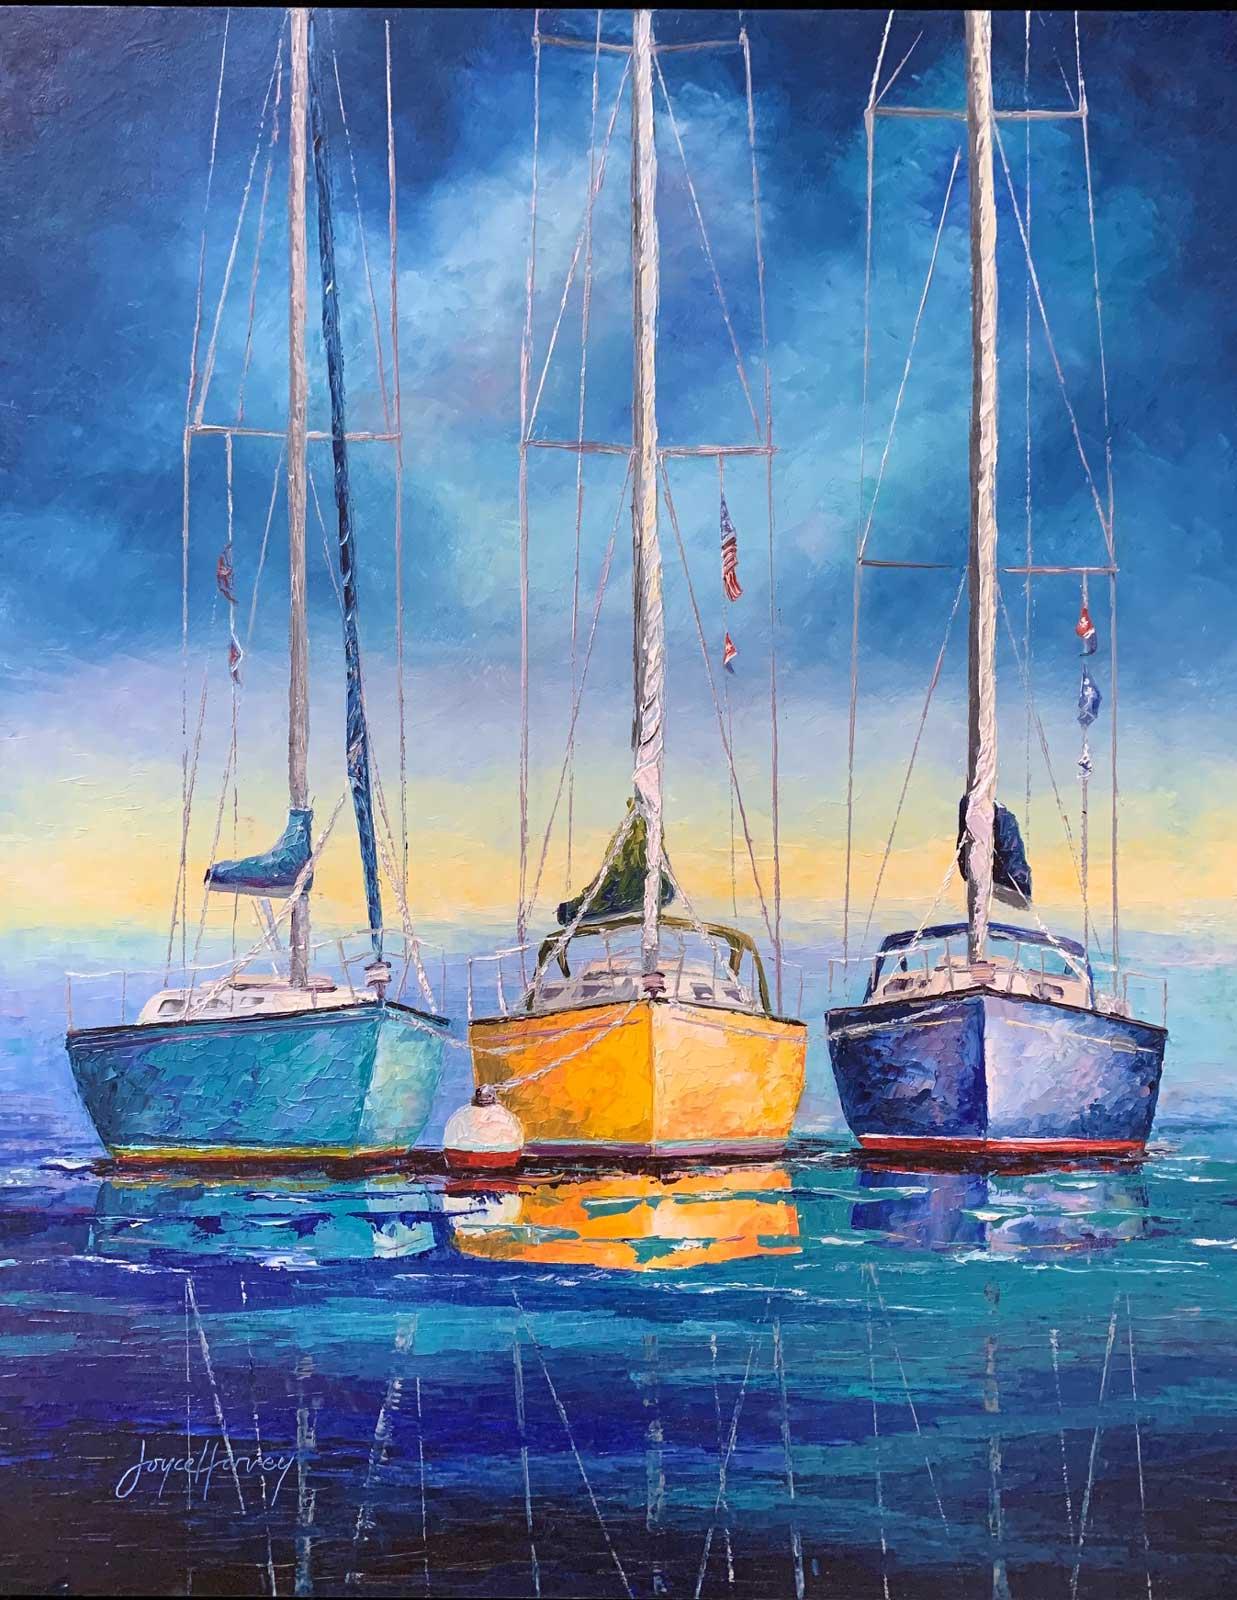 Joyce Harvey three for sail 16x20 oil $825